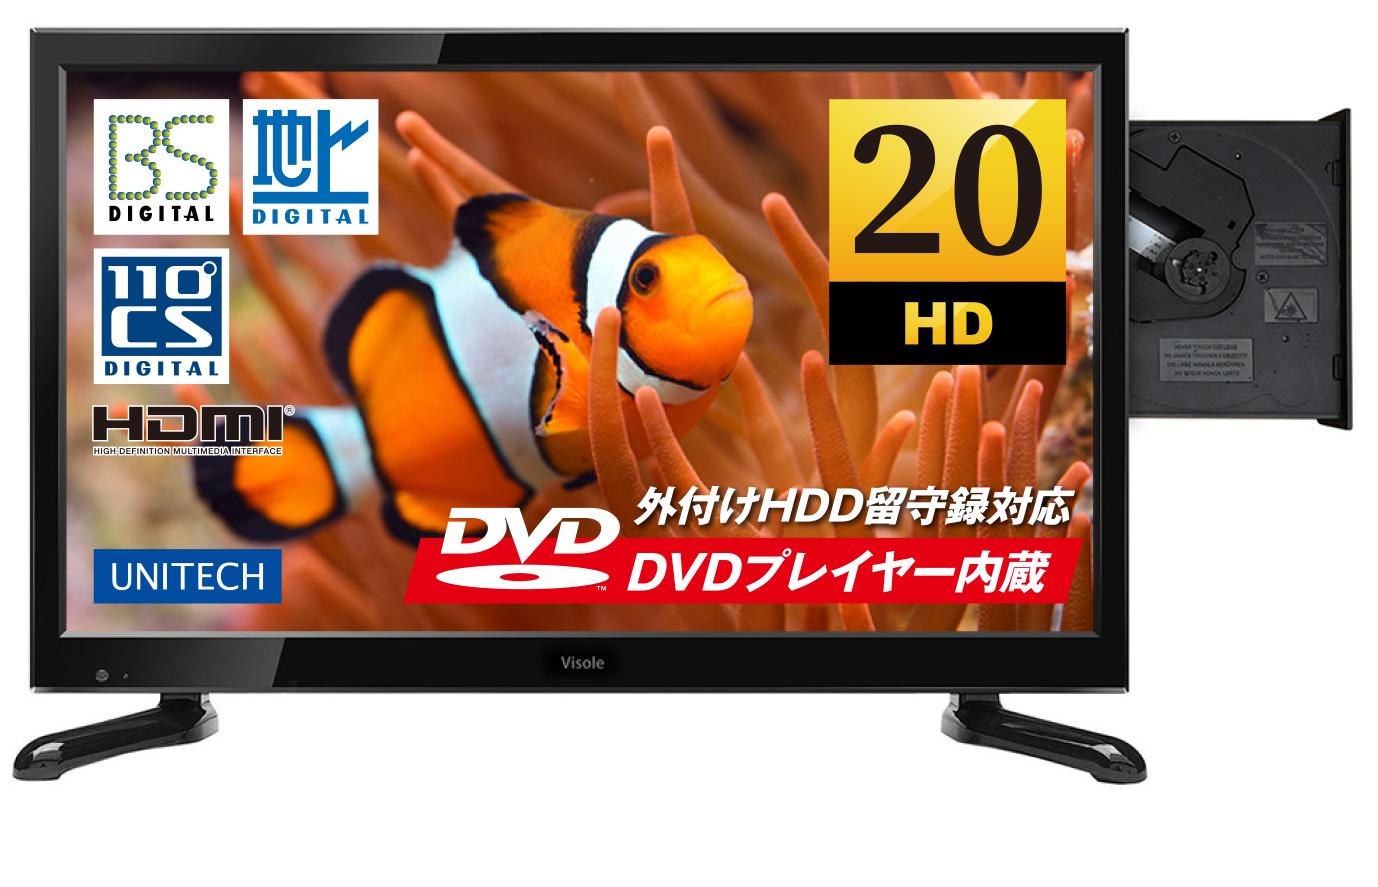 DVDプレーヤー内蔵 地上・BS/CS デジタルハイビジョン液晶テレビ (20V型)LCD2001G画像